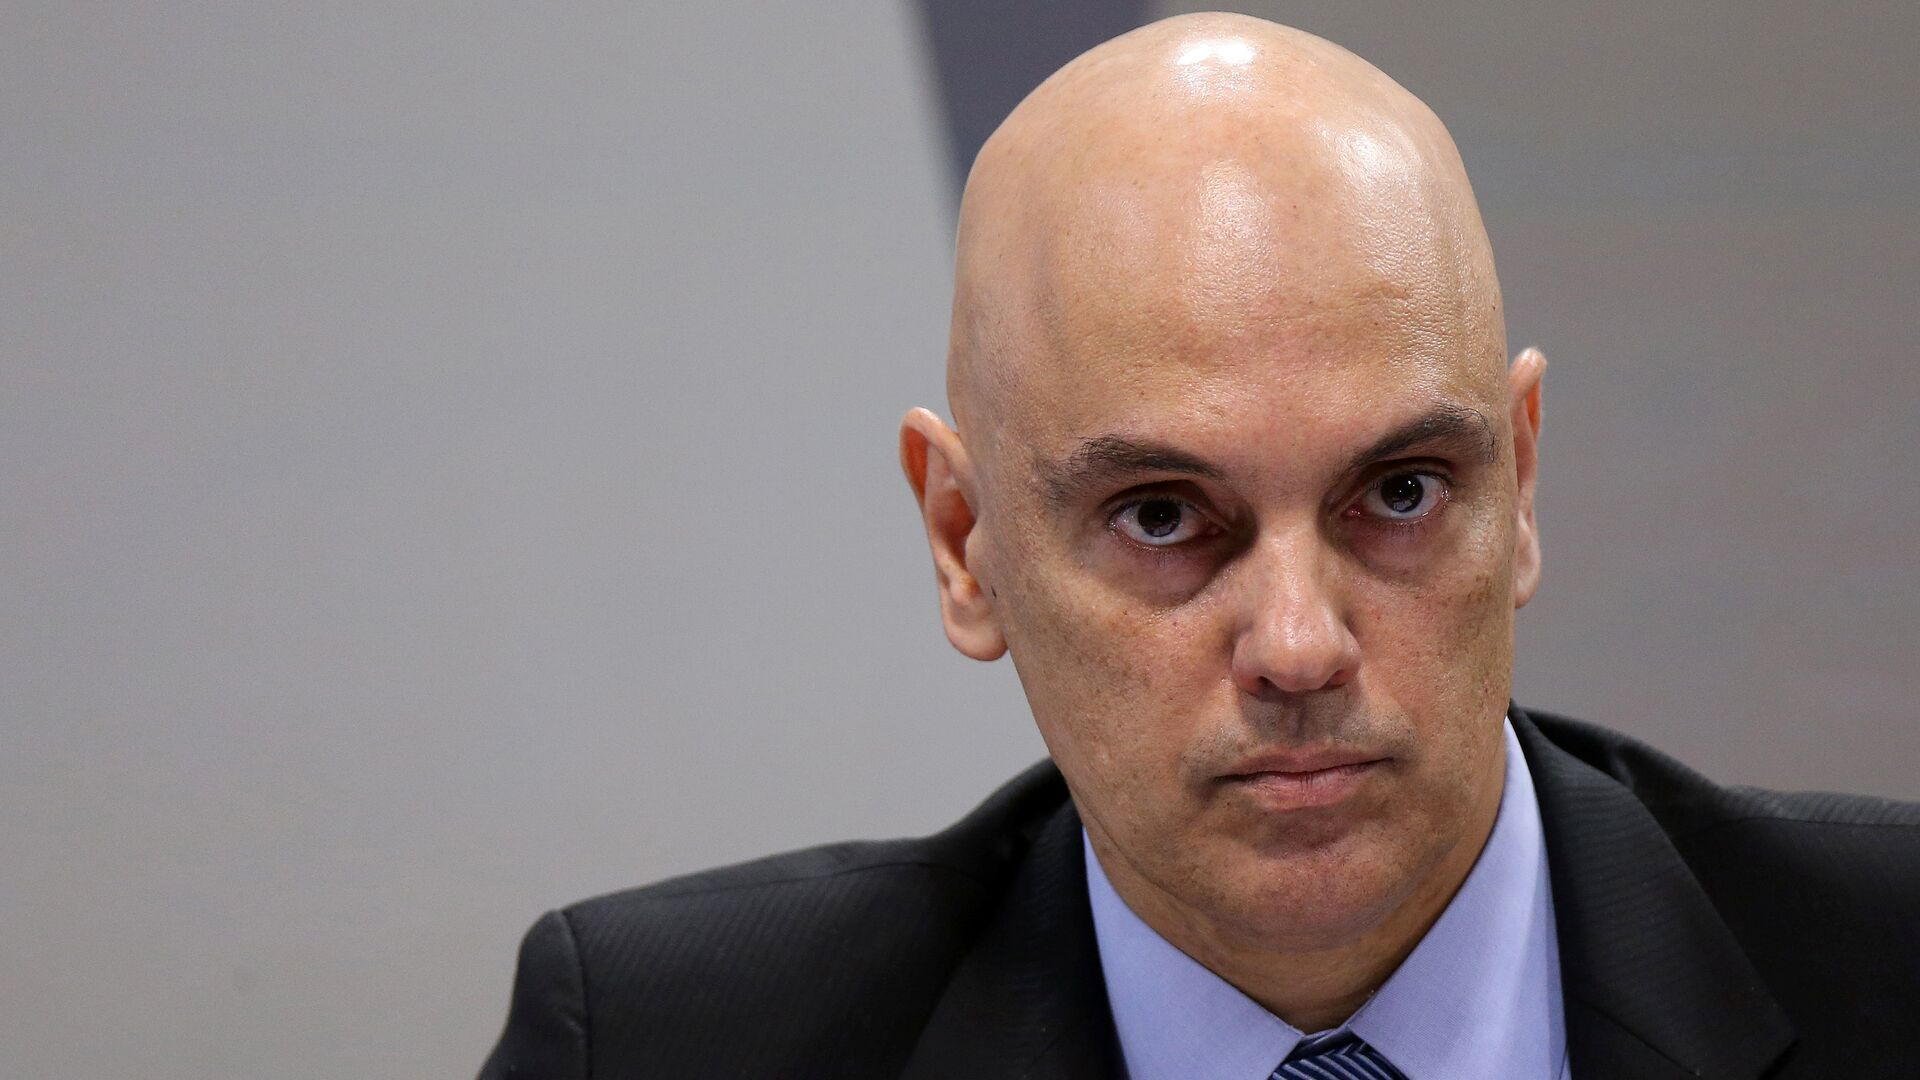 Alexandre de Moraes, juez del Tribunal Supremo Federal de Brasil - Sputnik Mundo, 1920, 20.08.2021